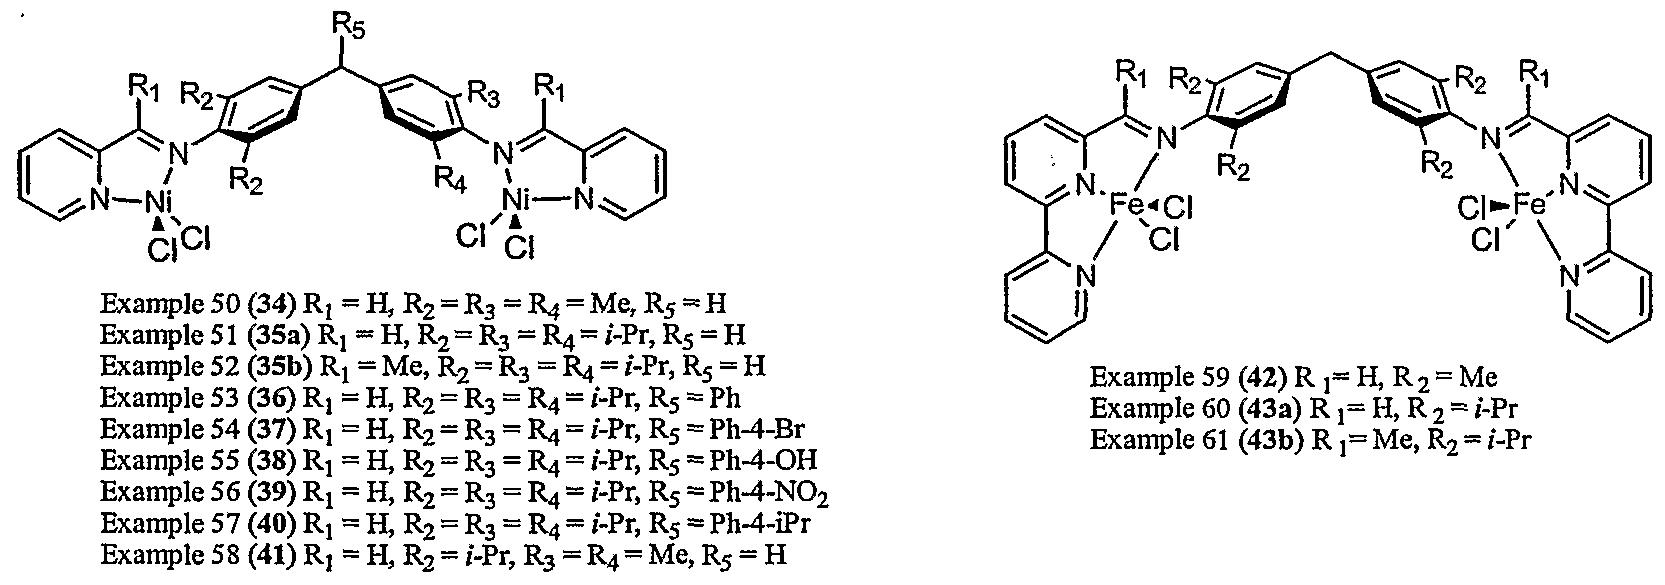 patent wo2005118605a1